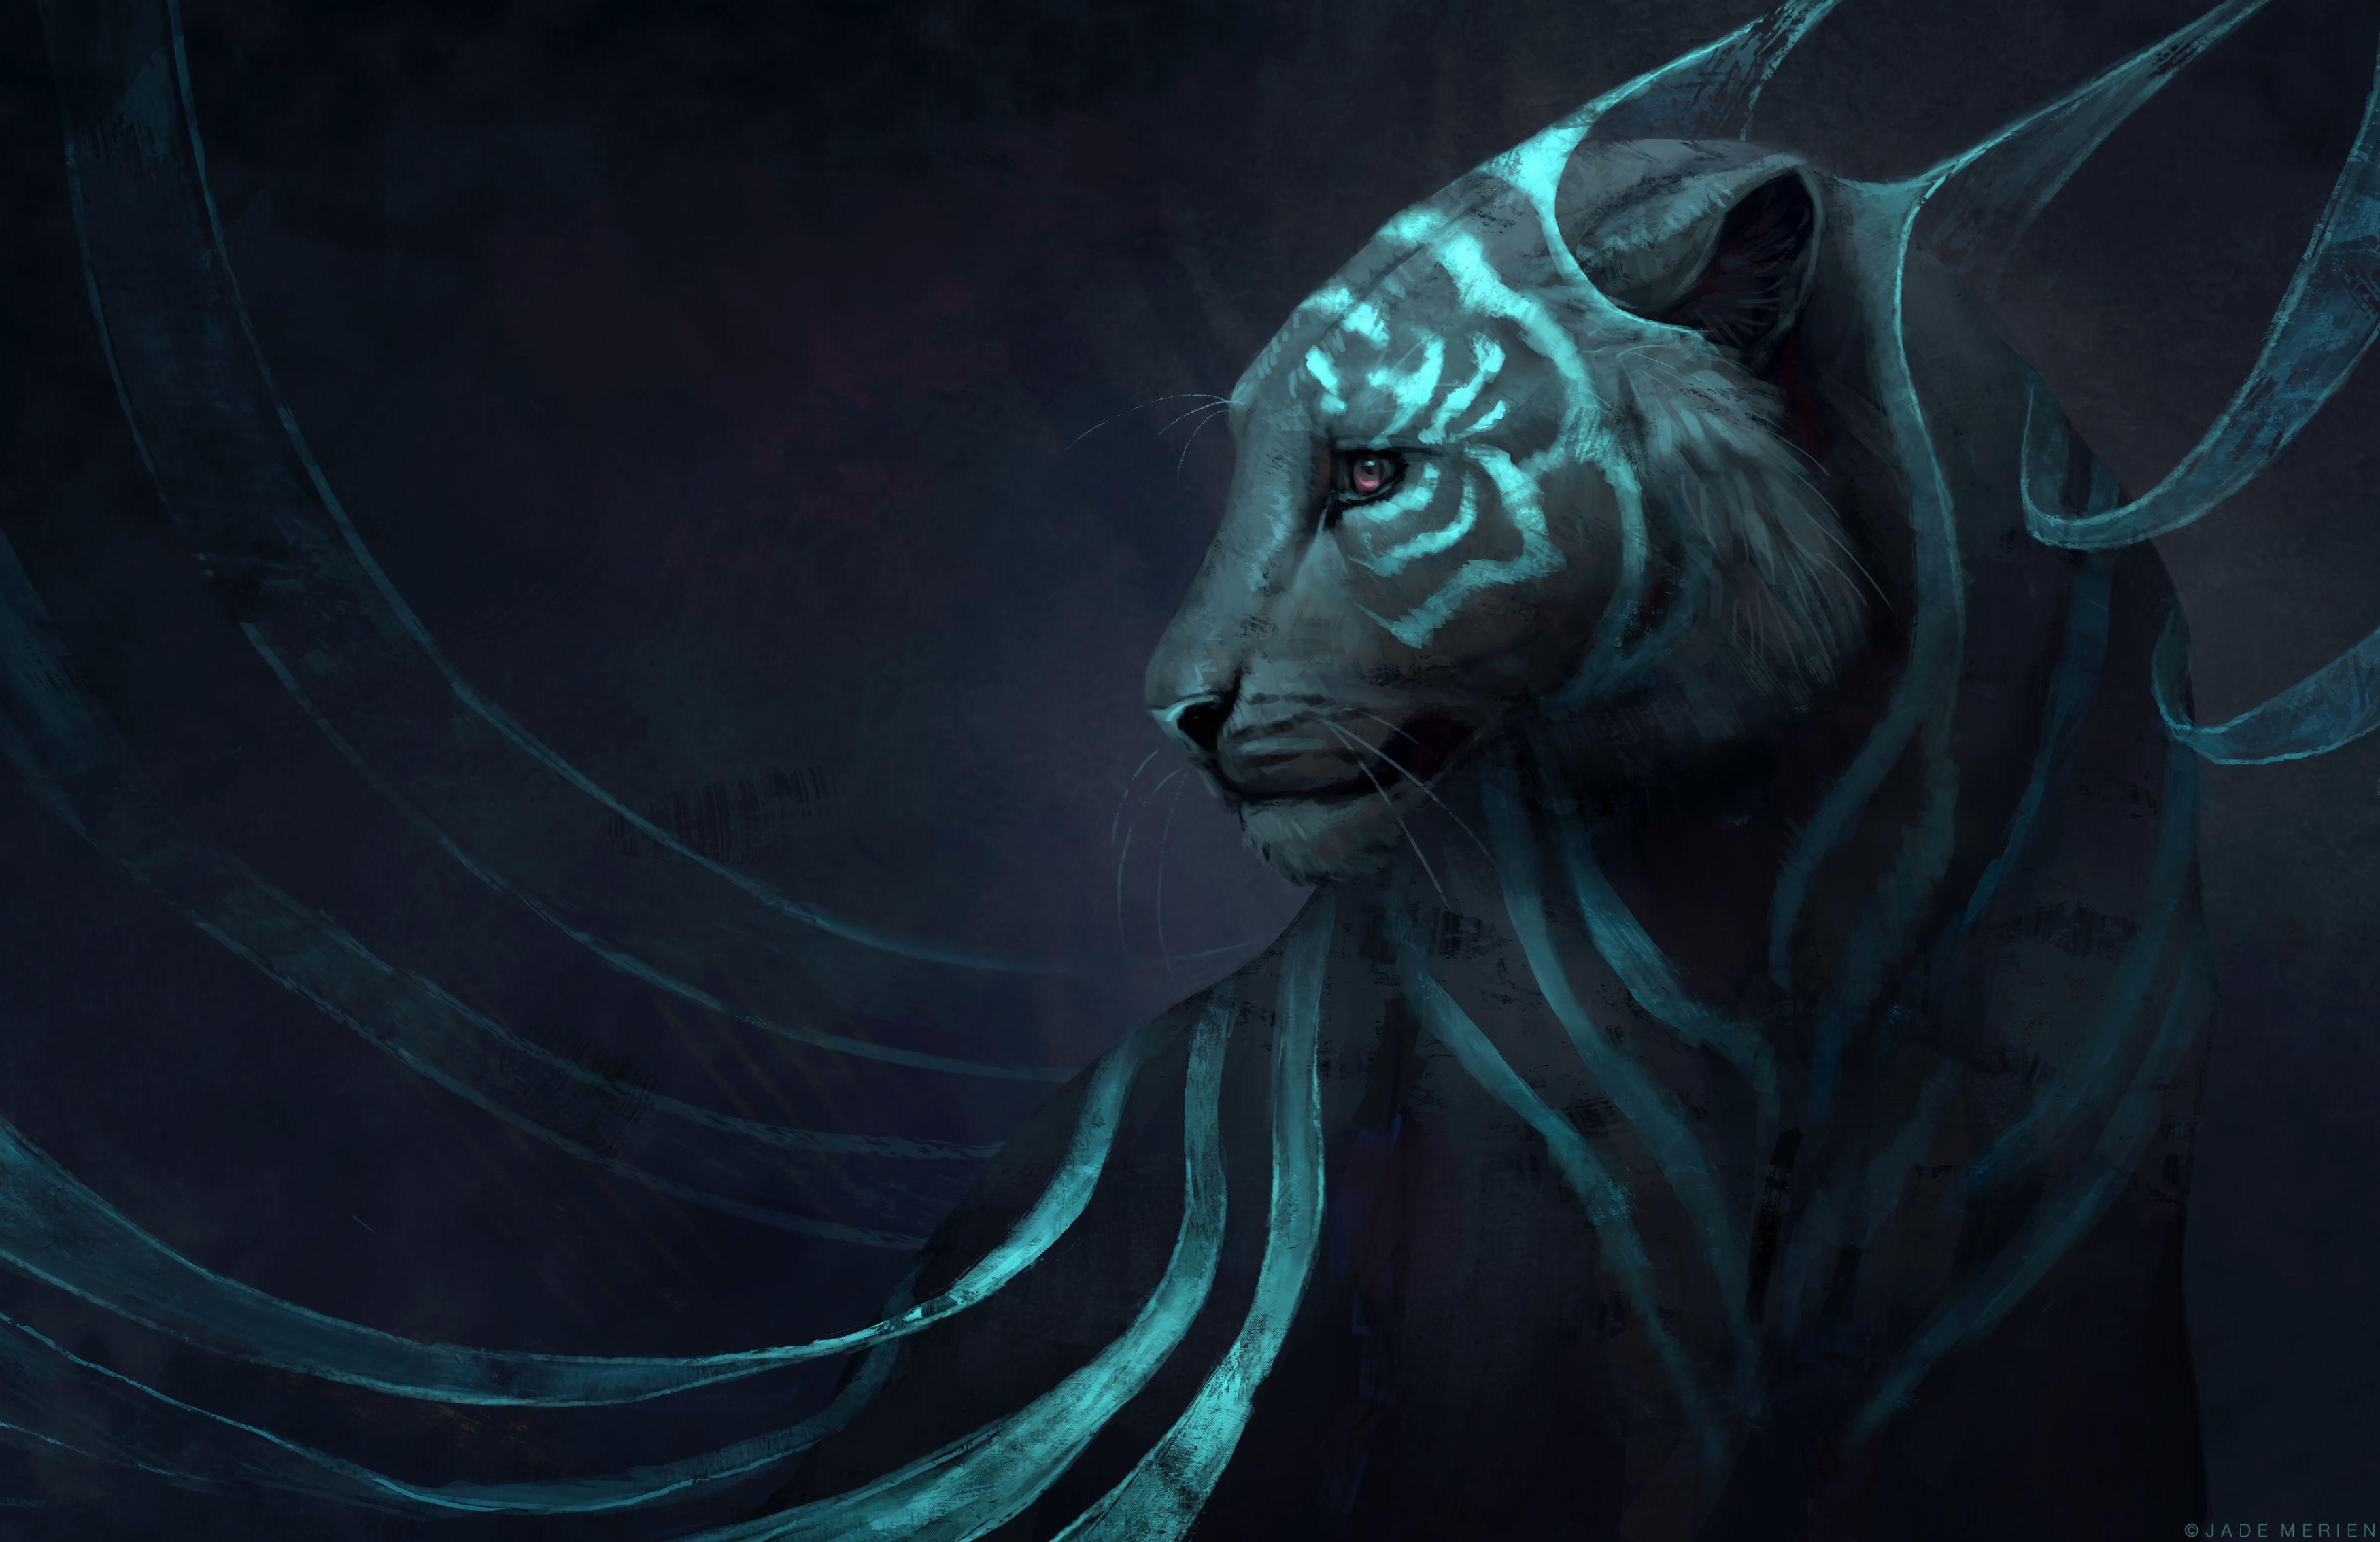 113460 download wallpaper Art, Predator, Tiger, Fantastic screensavers and pictures for free